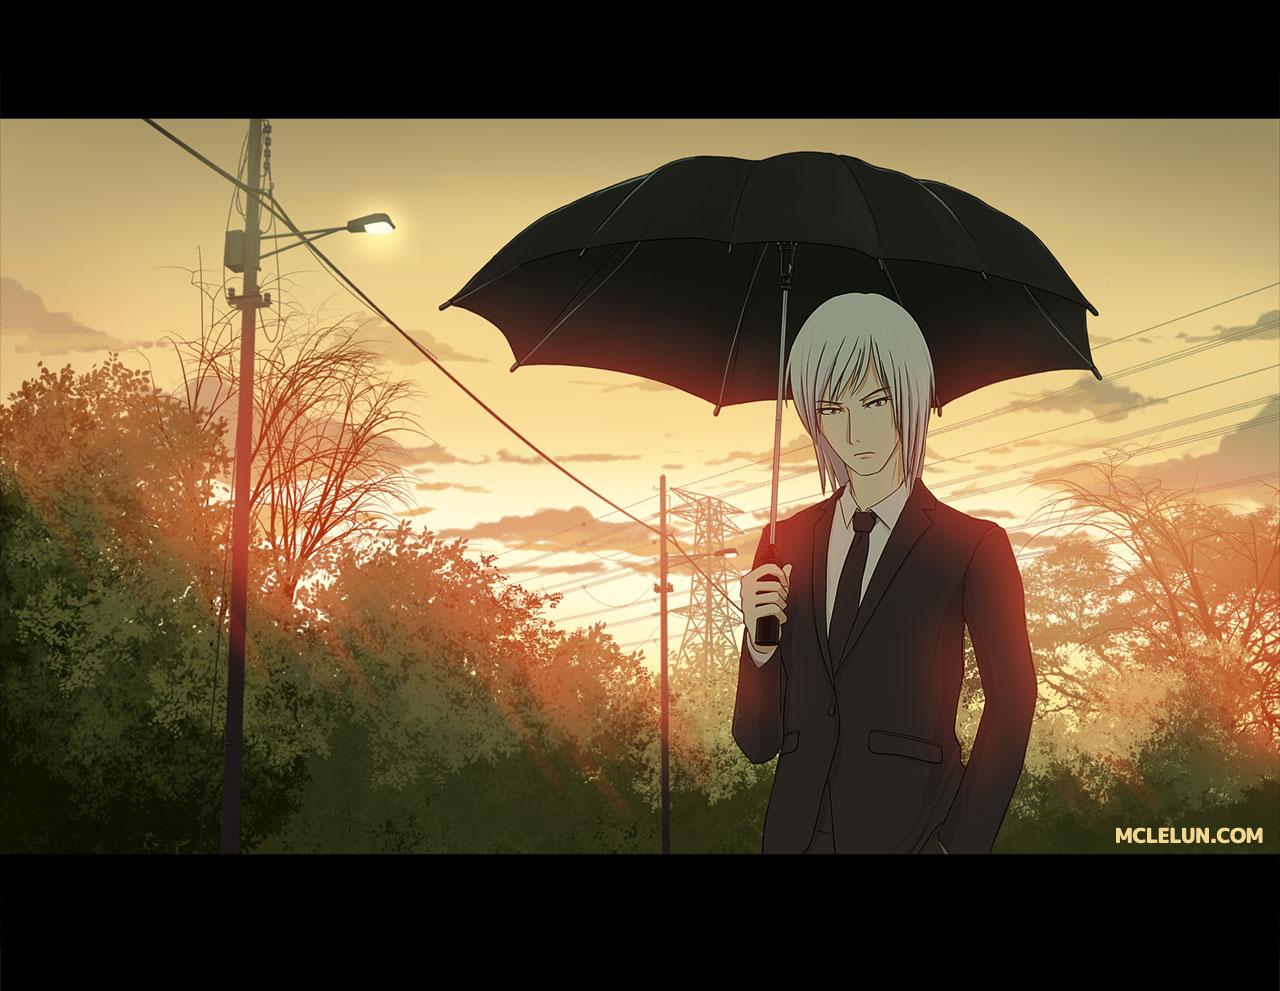 umbrella_by_mclelun-d7mf41z.jpg